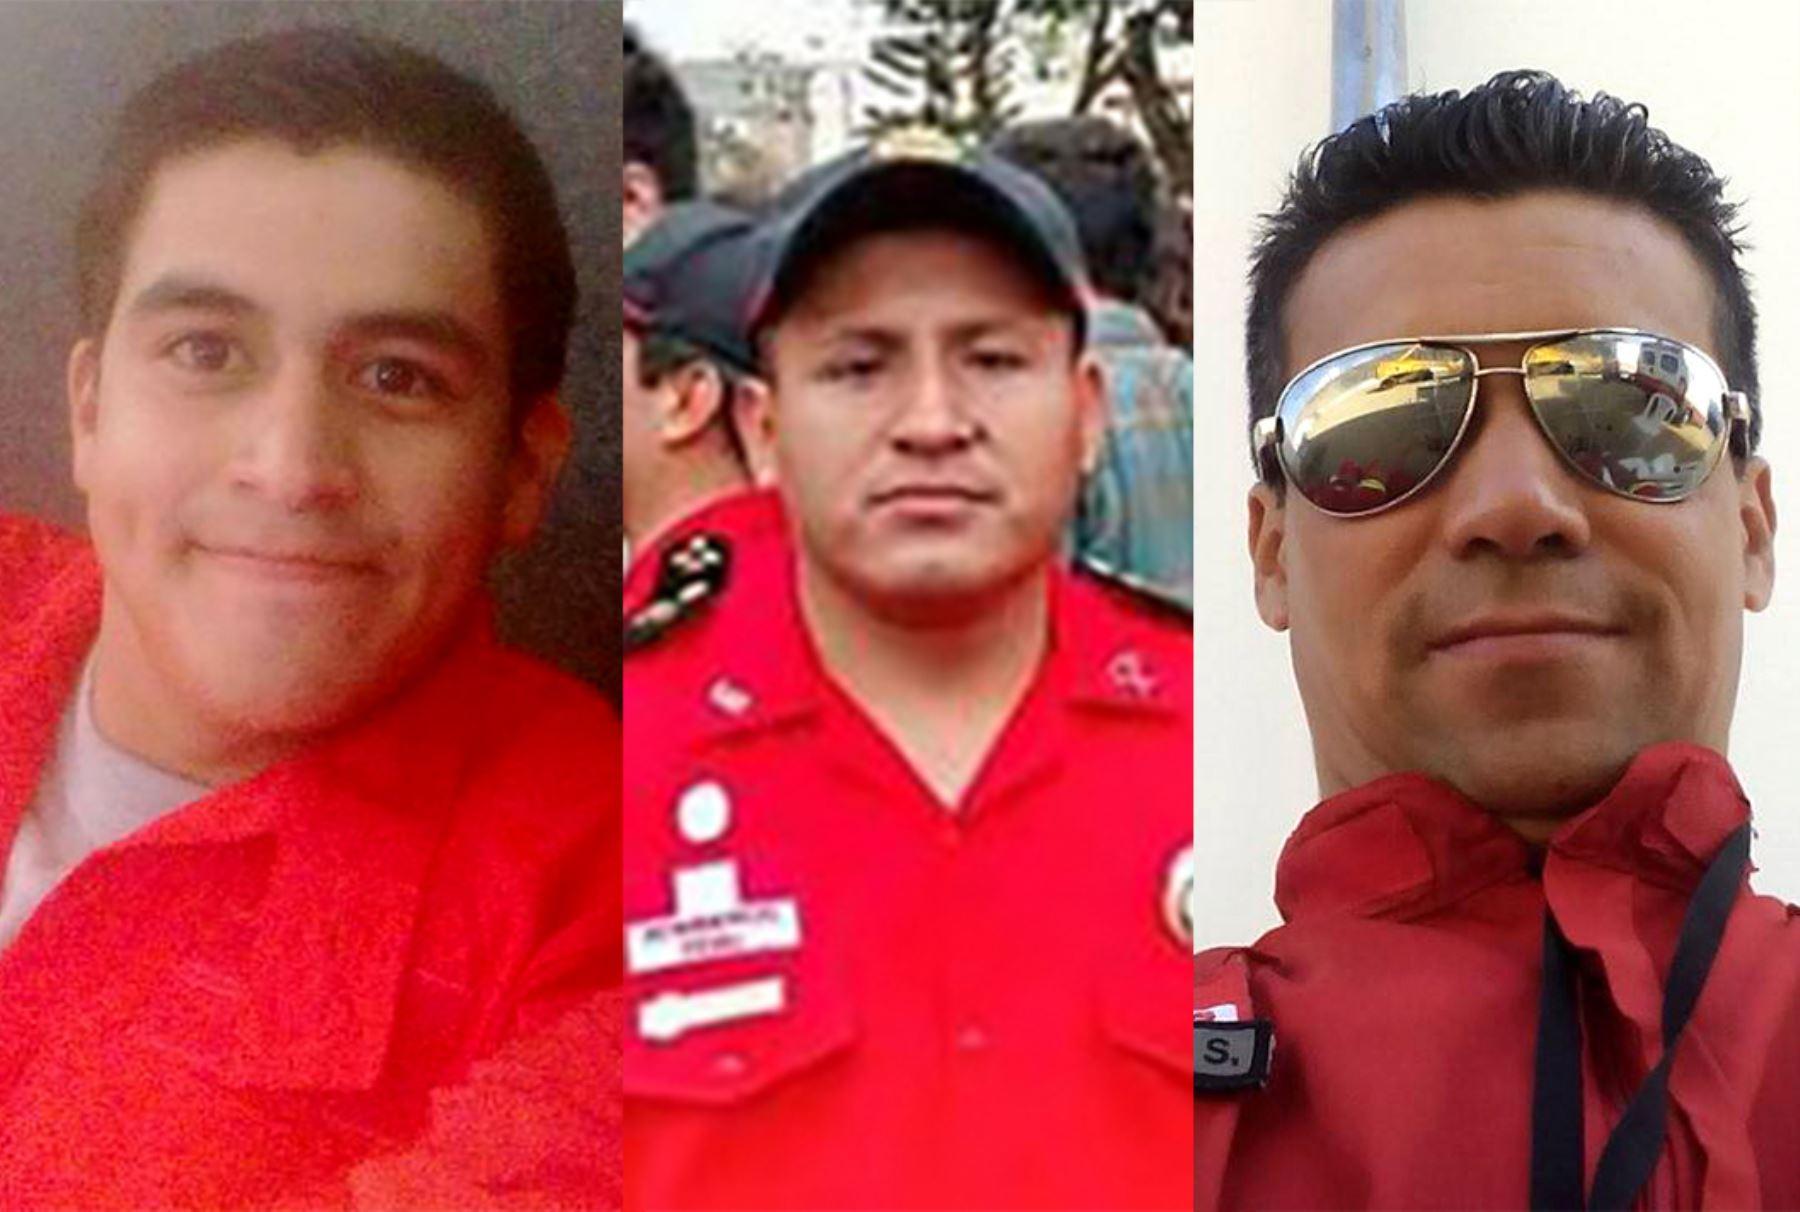 19/10/2016.  Alonso Salas Chanduví, Raúl Lee Sánchez Torres y Eduardo Jiménez Soriano.